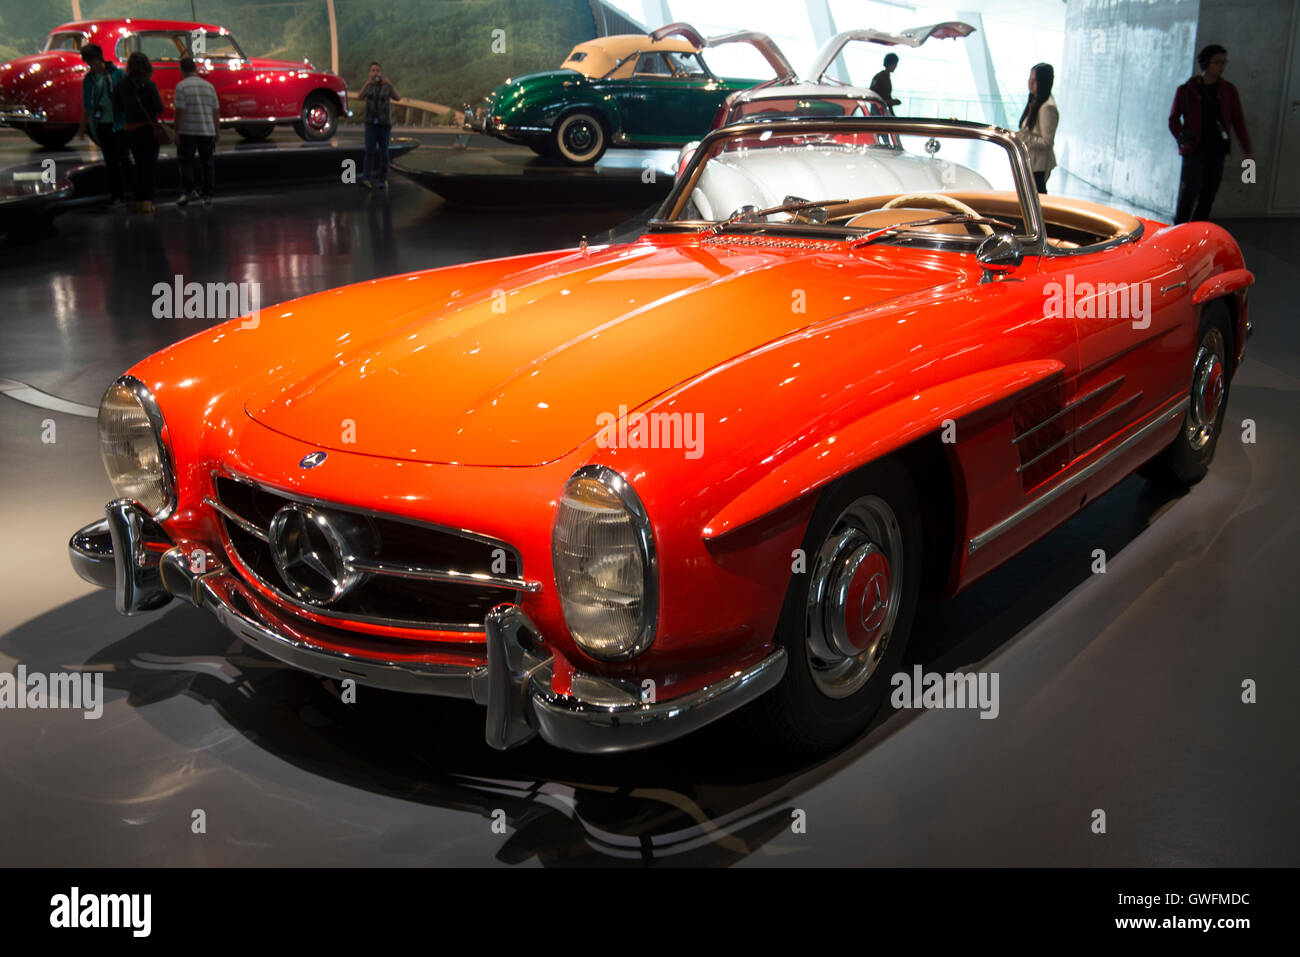 1962 Mercedes-Benz 300 SL Roadster, succeeded in 1957 the legendary 'Gullwing', Mercedes-Museum, Stuttgart, - Stock Image